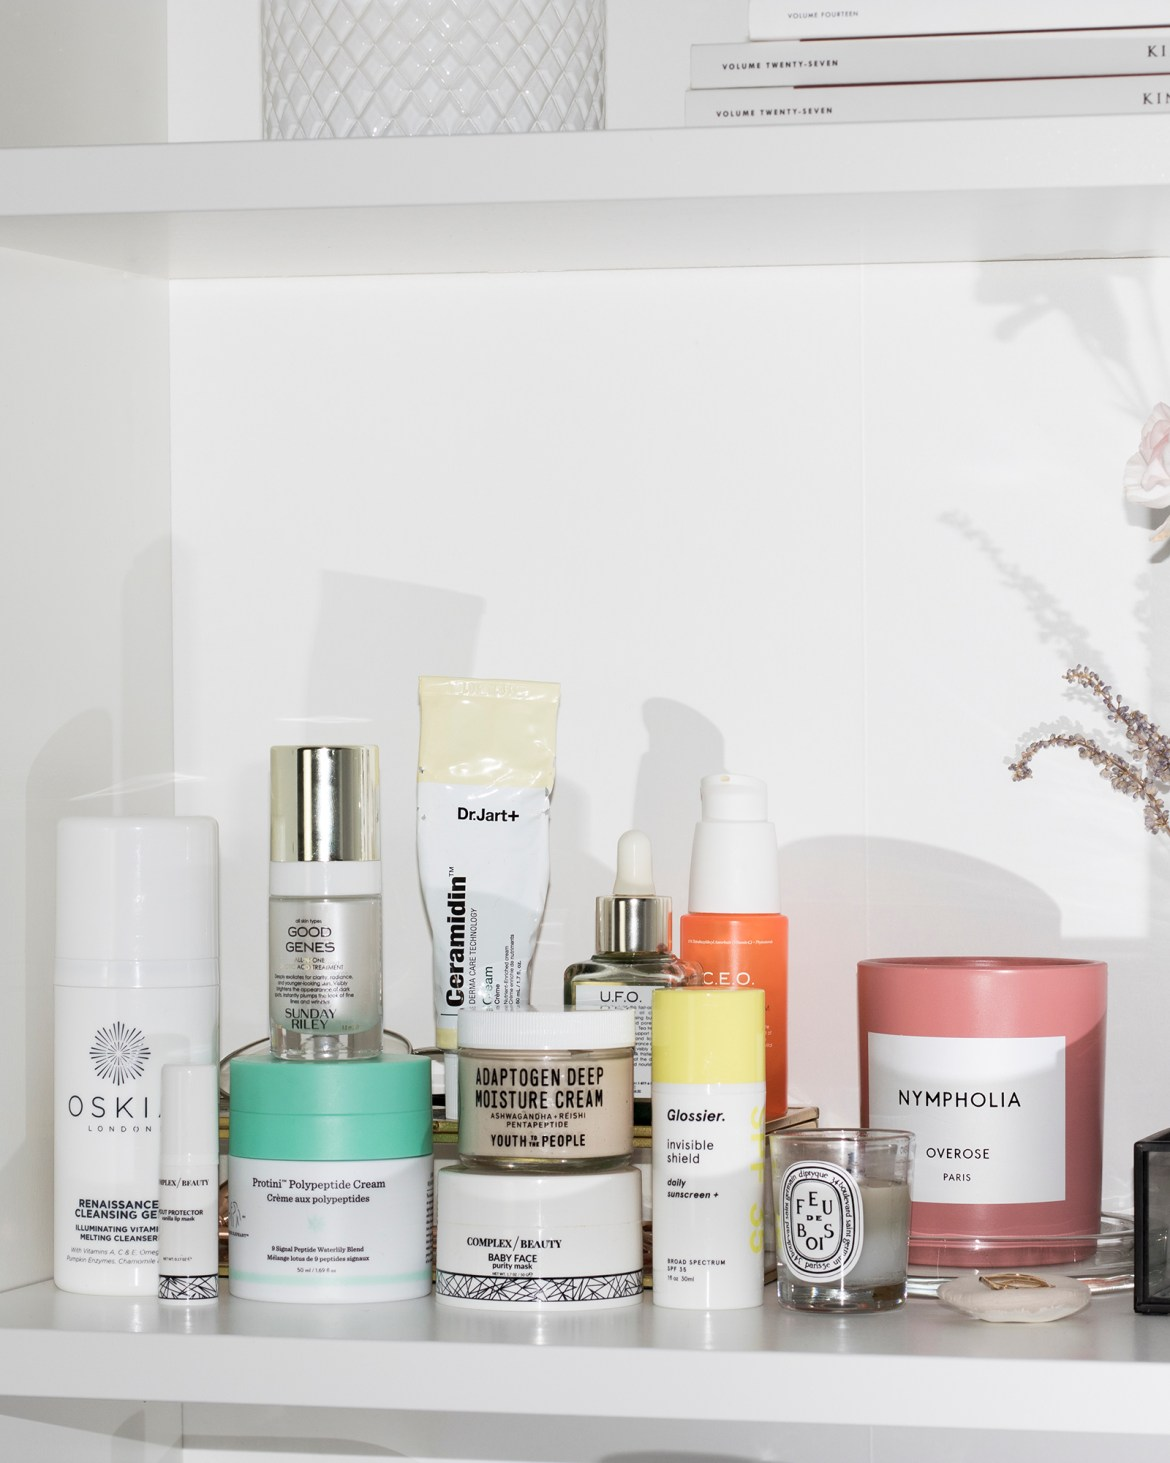 skincare shelfie featuring drunk elephant protini, glossier spf, YTTP adaptogen cream, and more